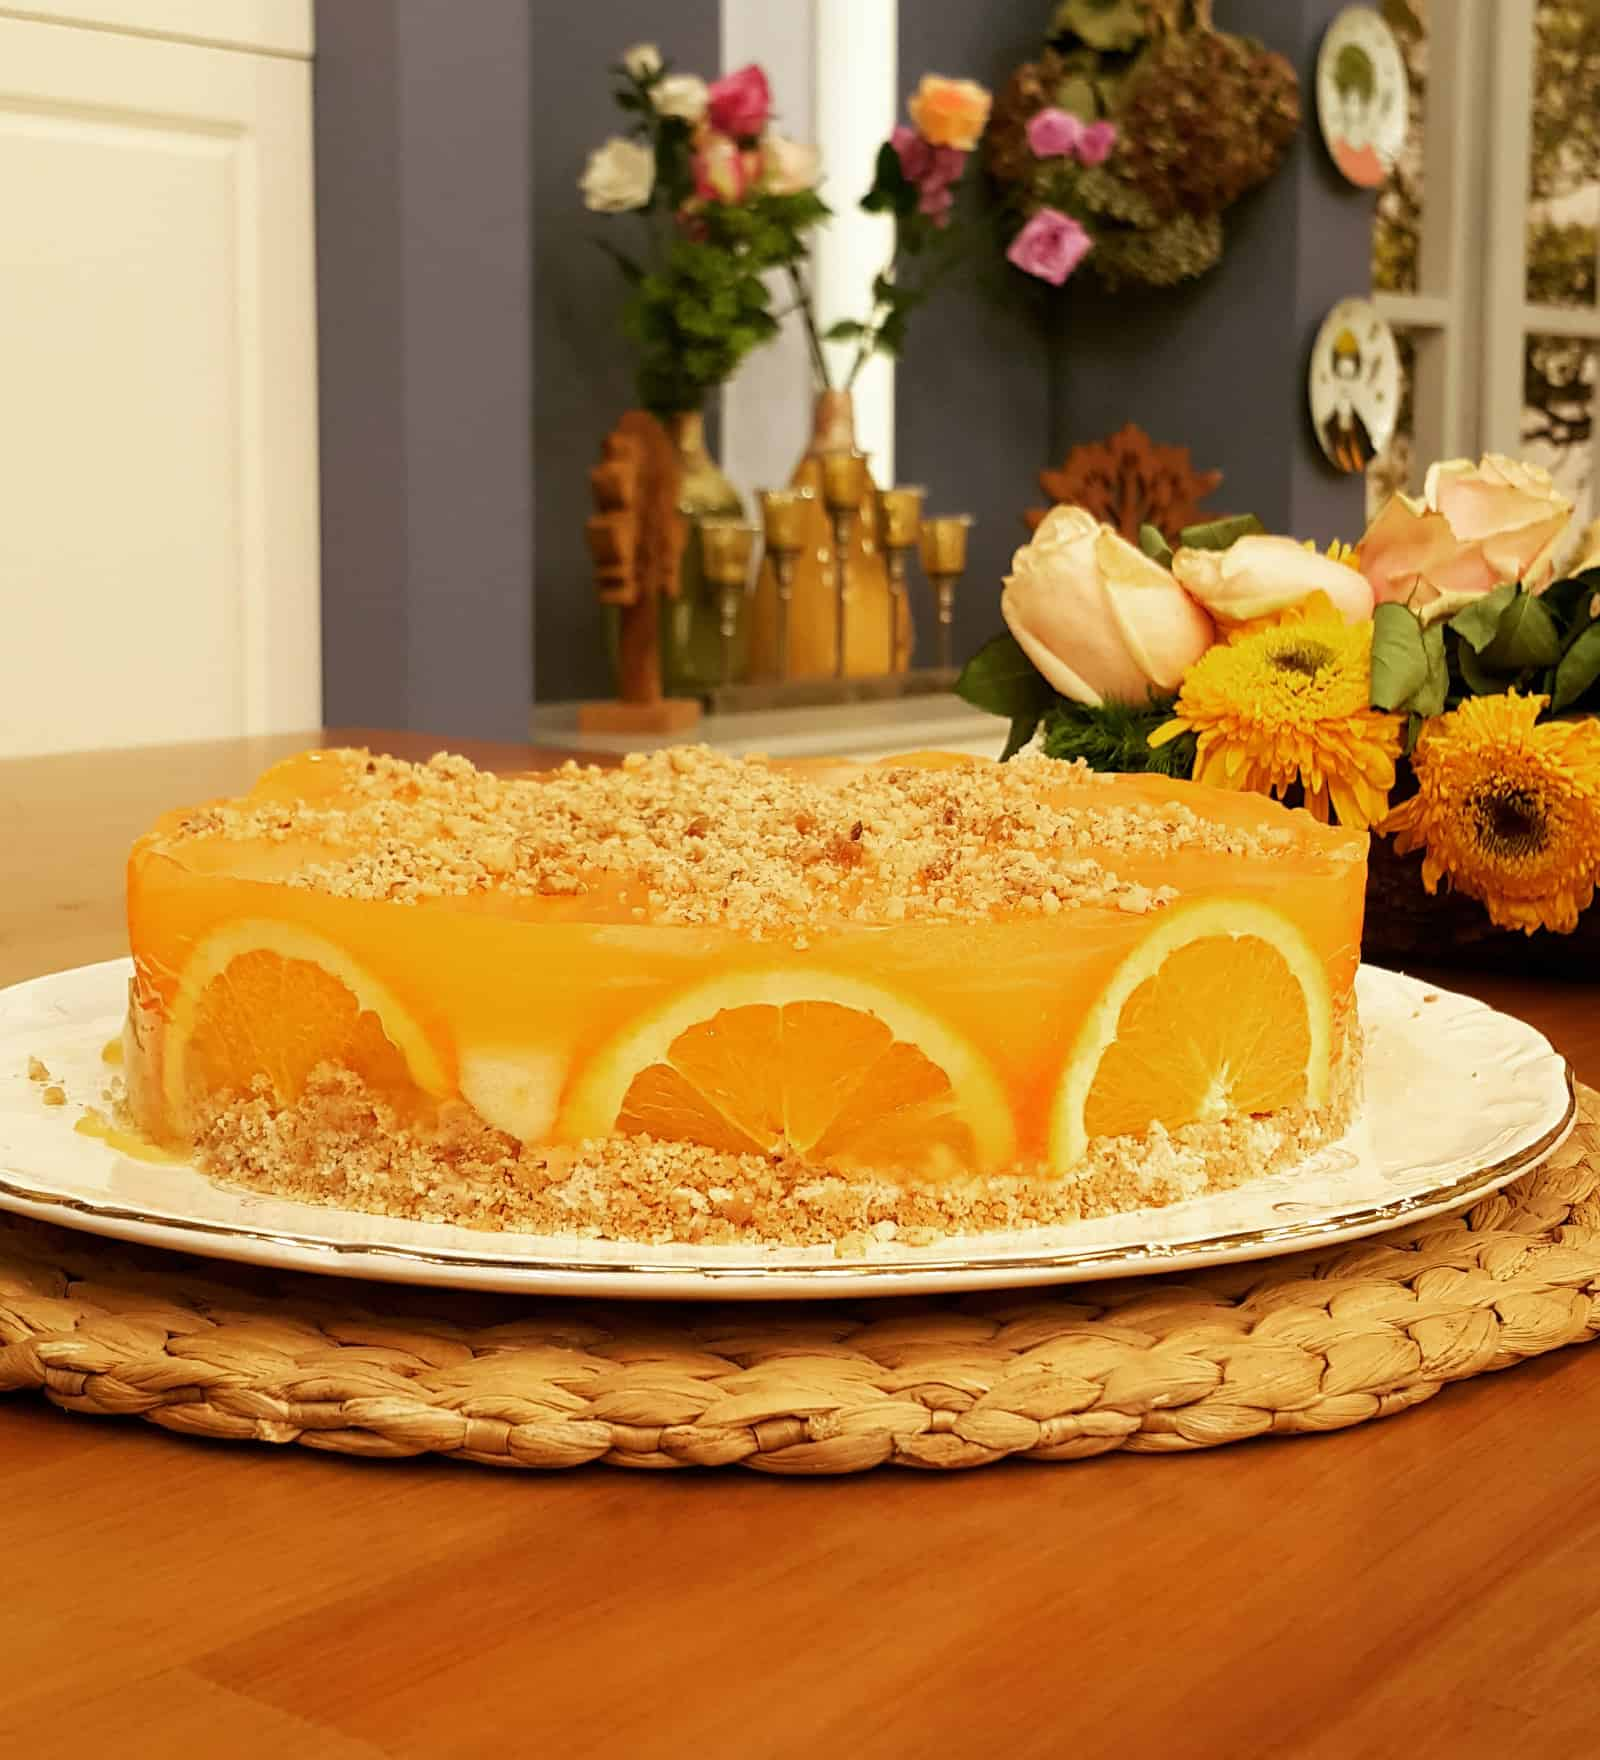 Portakal Diliminde Sütlü Irmik Helvası